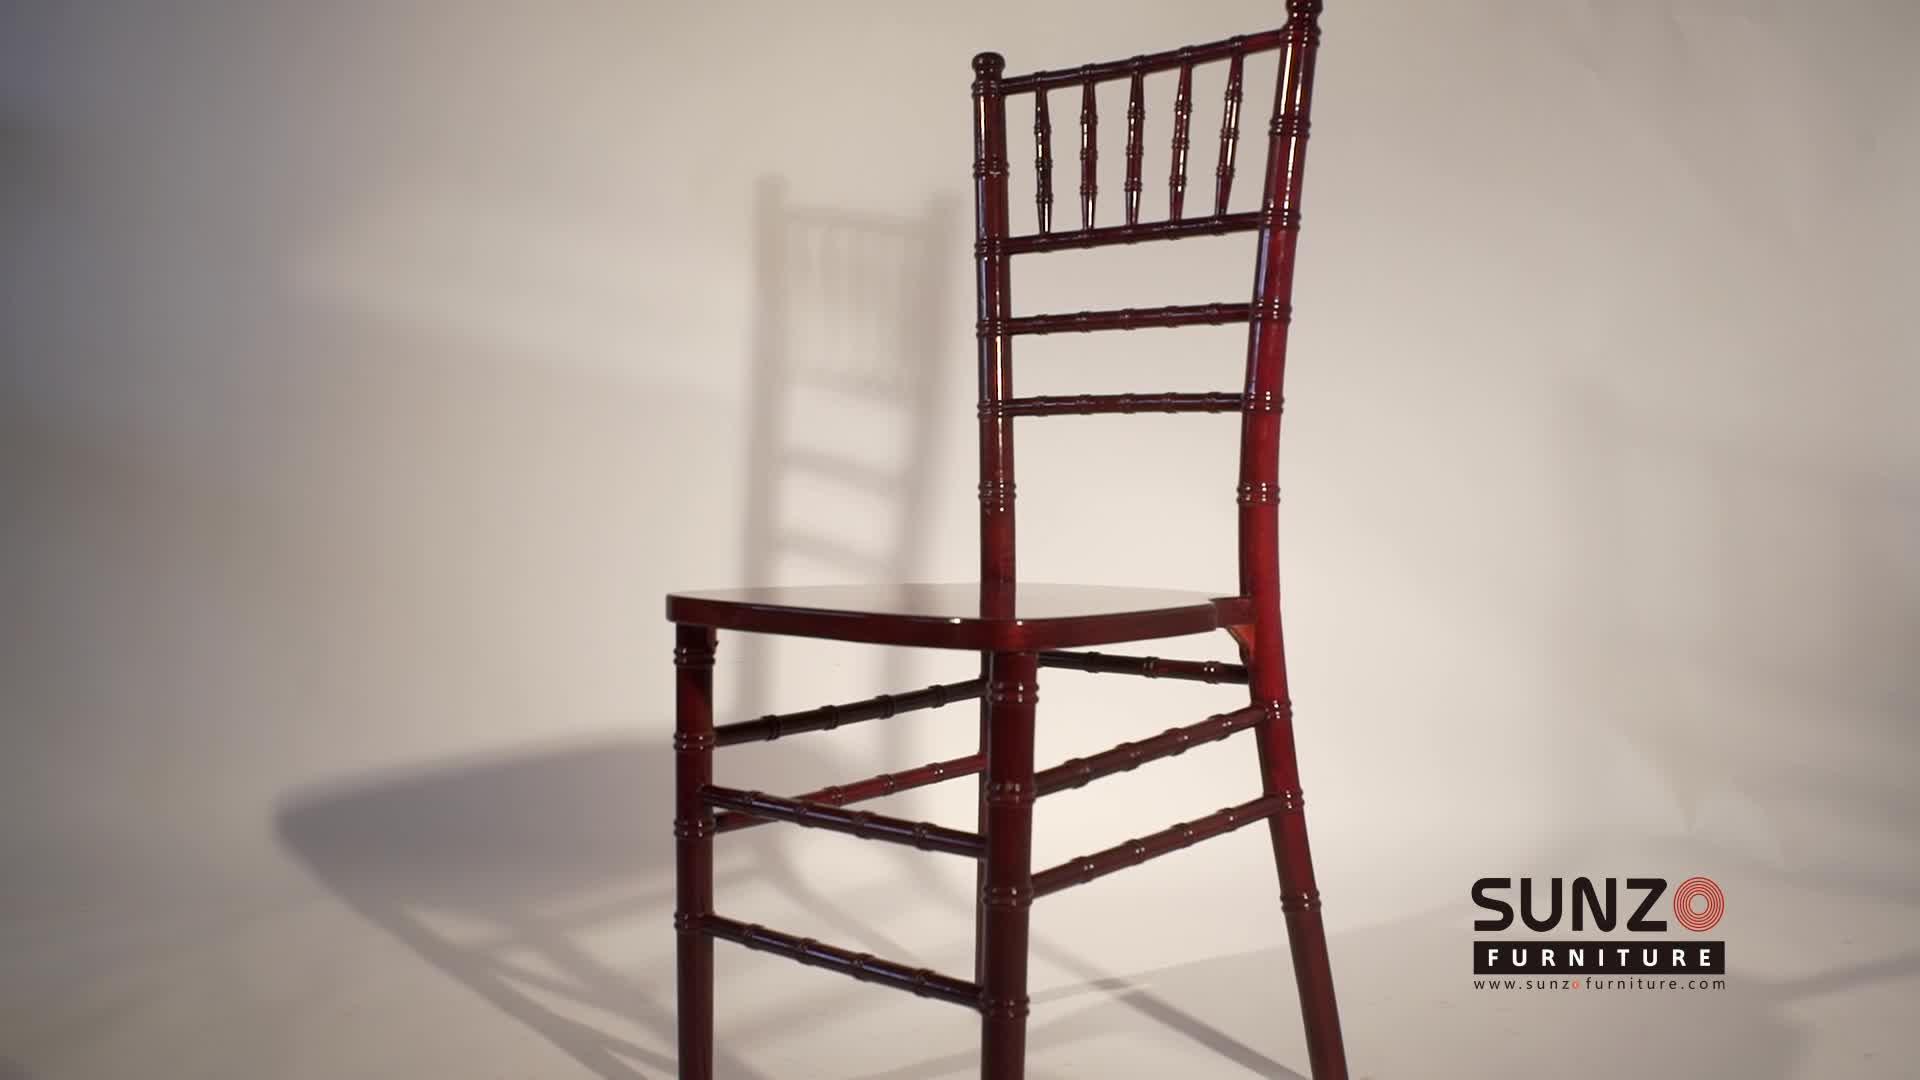 wedding chair alibaba spandex covers cheap wood chiavari resin white weddings and event